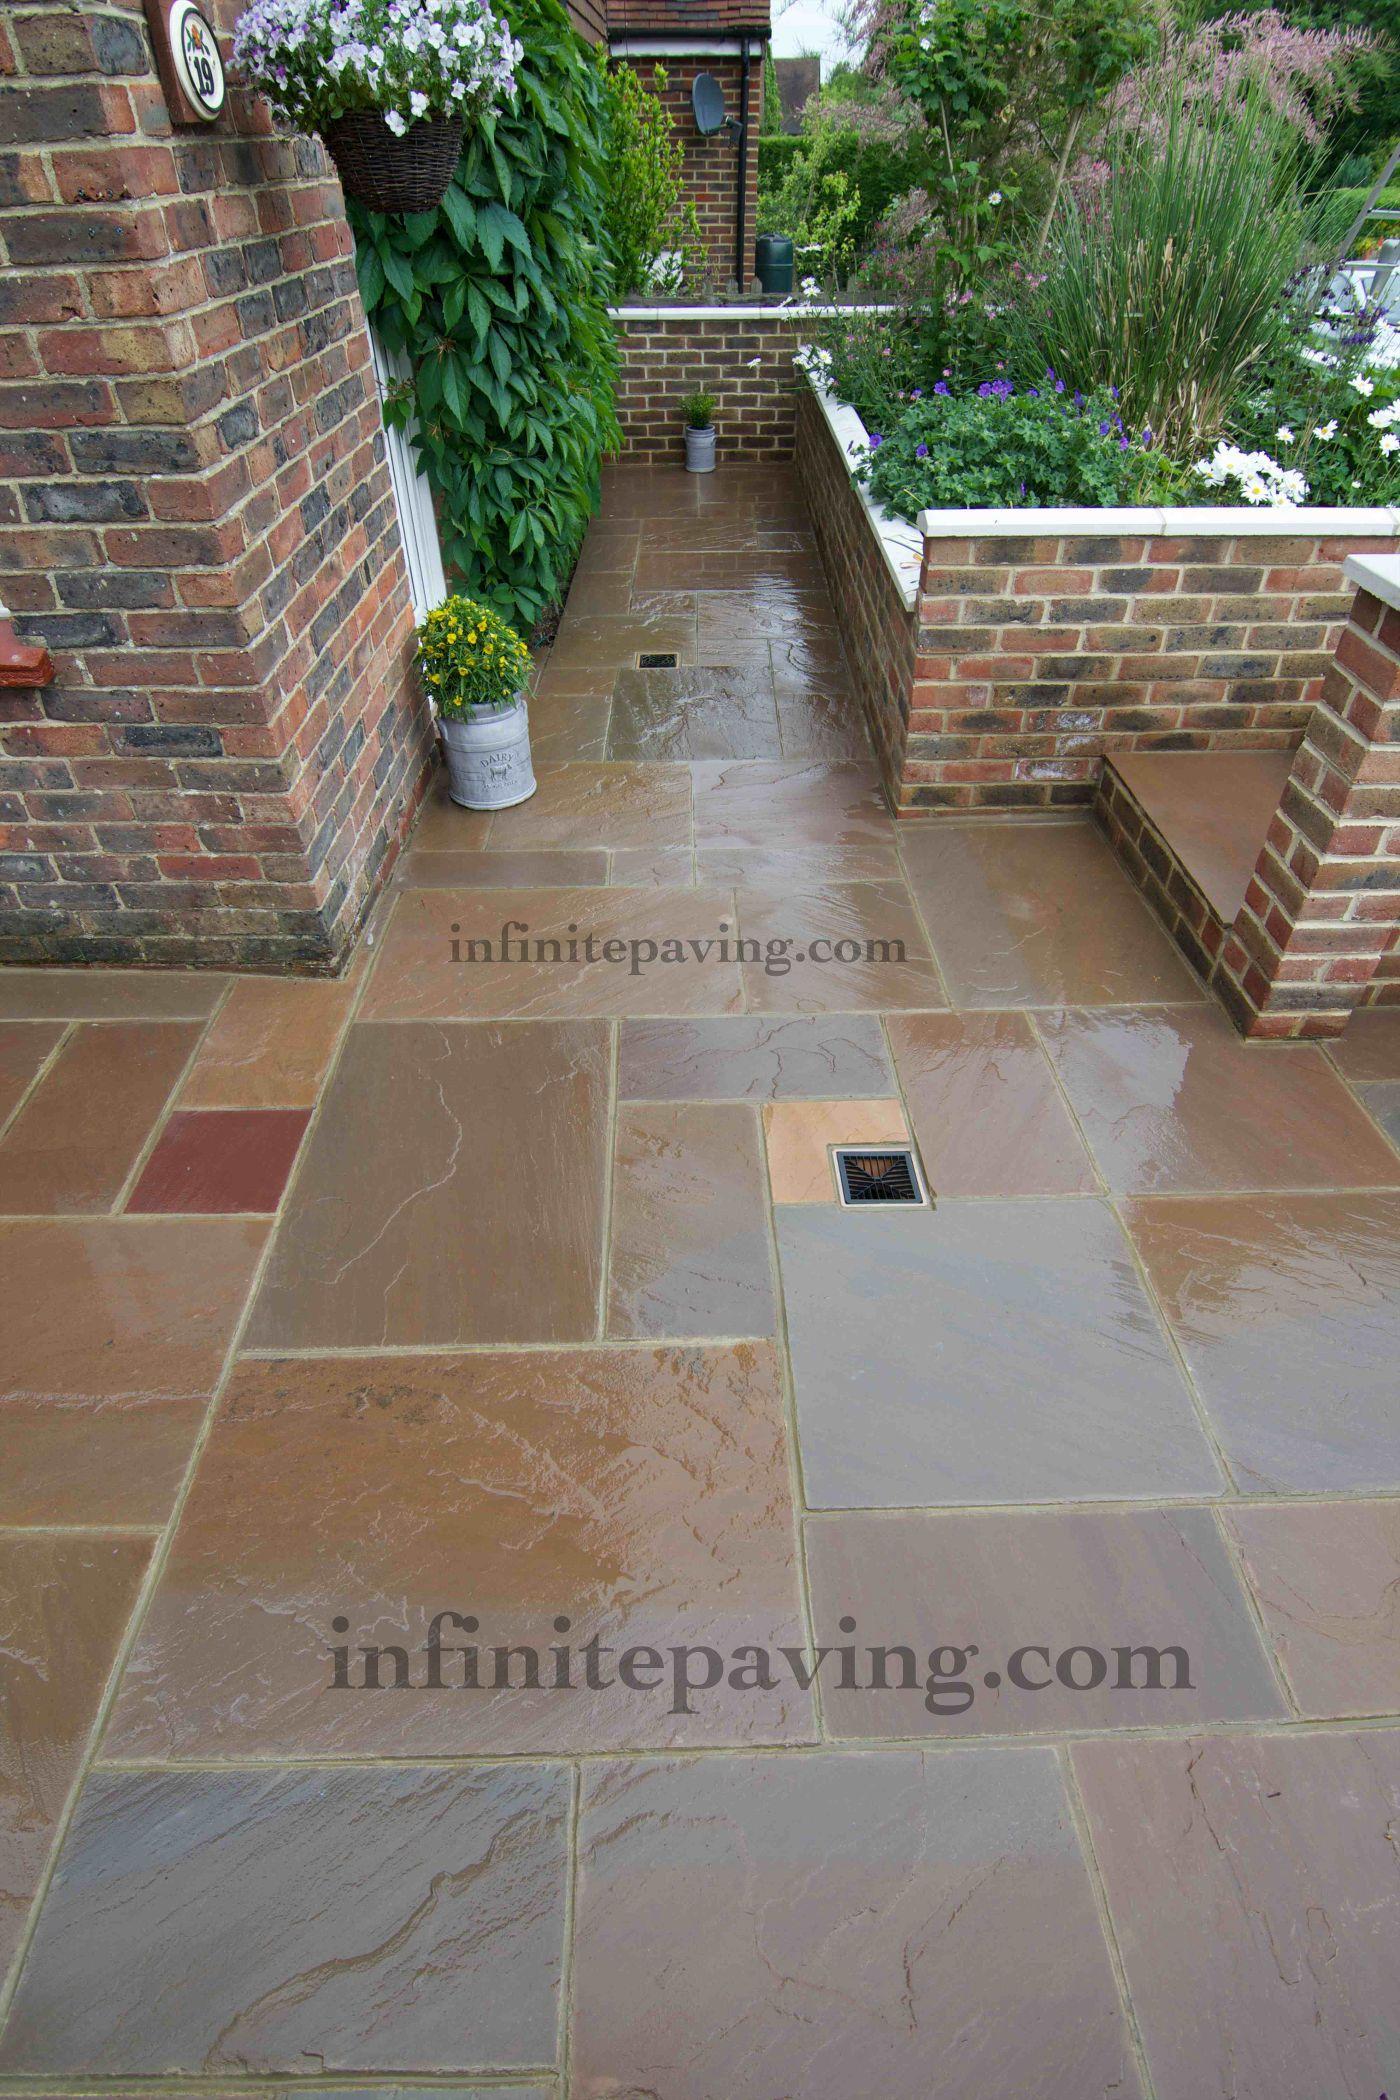 infinitepaving - high quality natural stone paving, indian